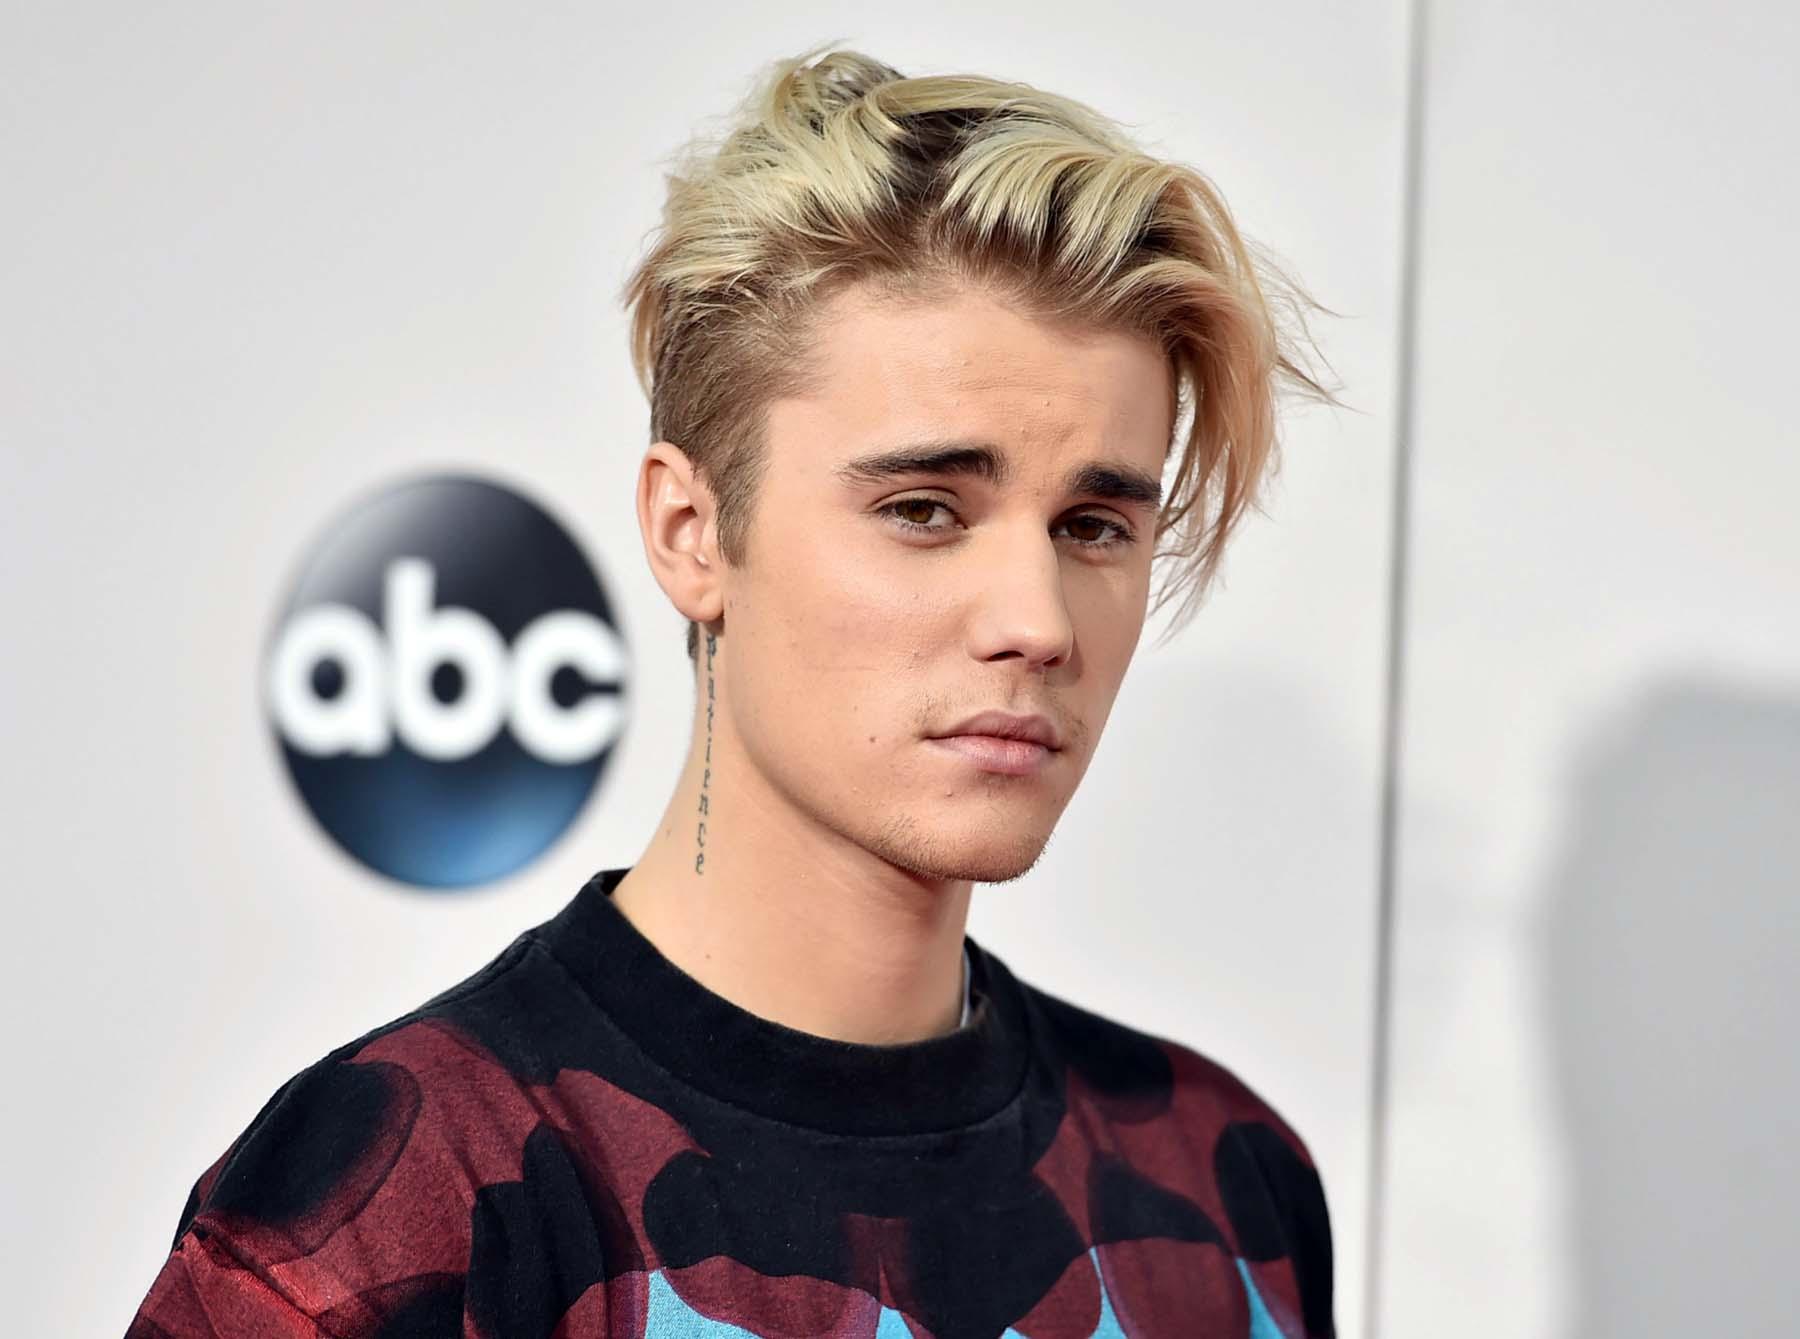 Justin Bieber Canadian Singer-songwriter